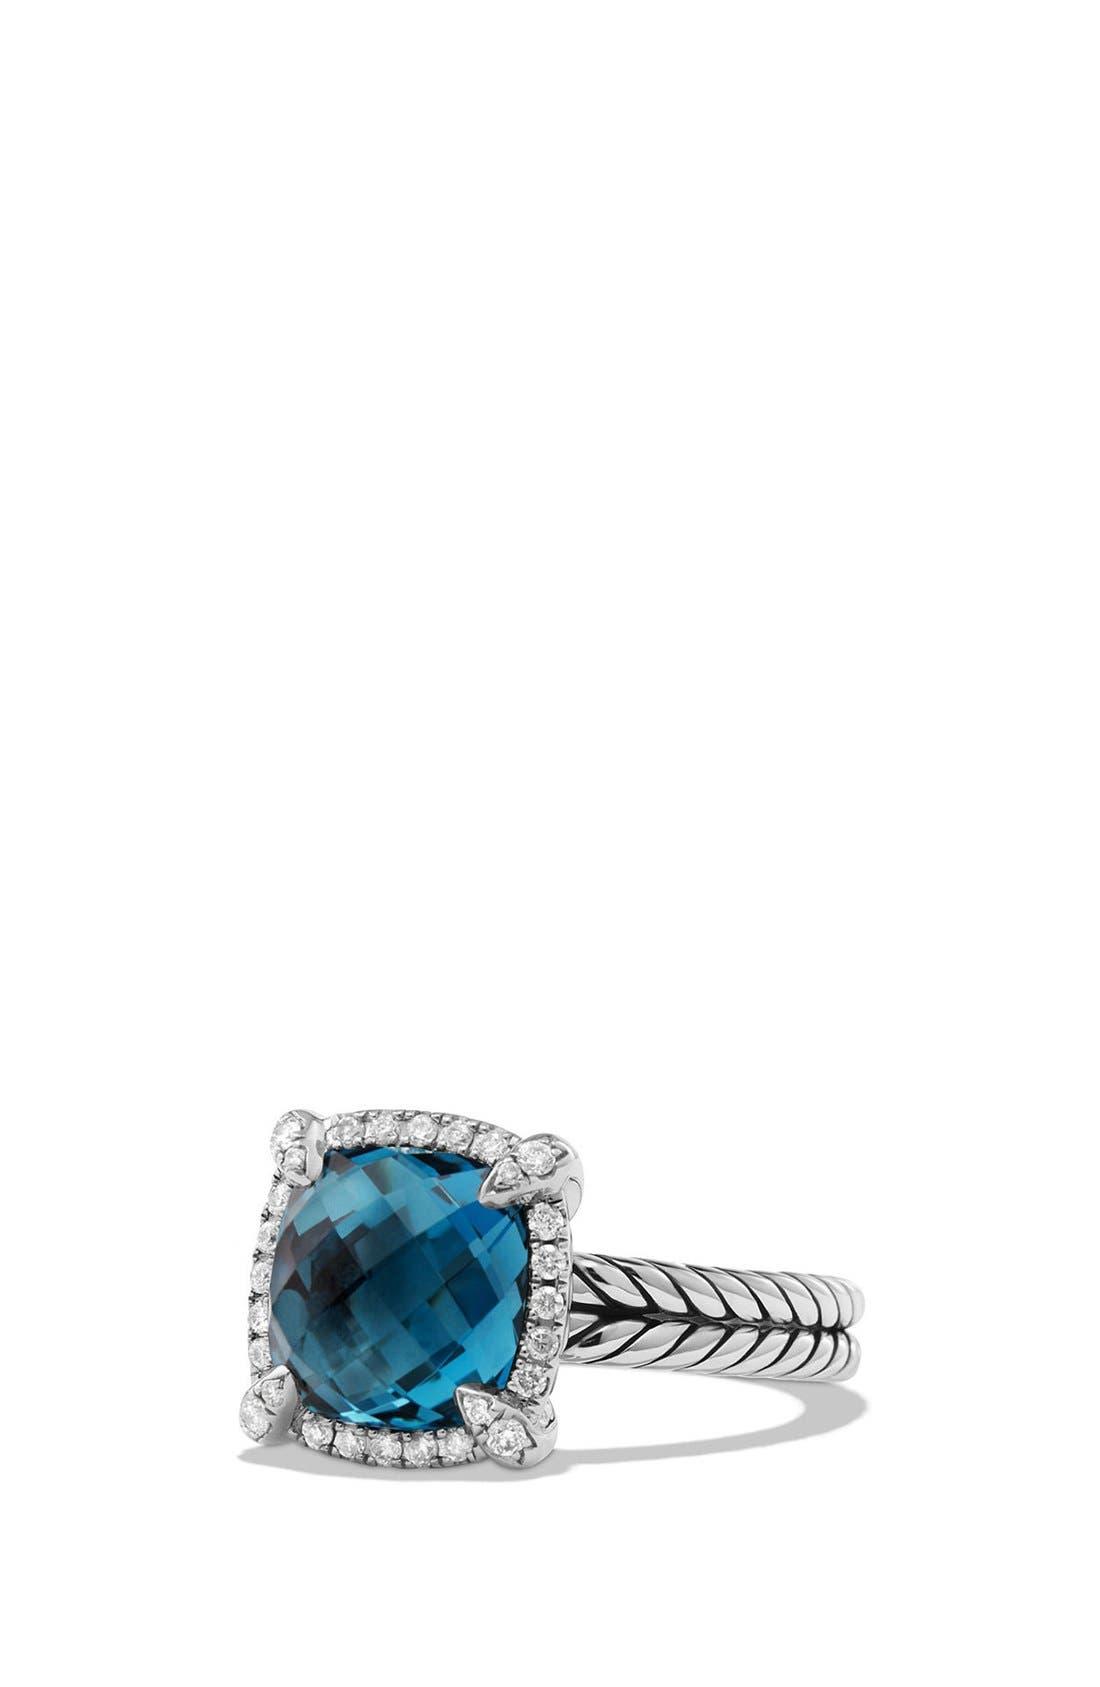 'Châtelaine' Small Pavé Bezel Ring with Diamonds,                         Main,                         color, Blue Topaz